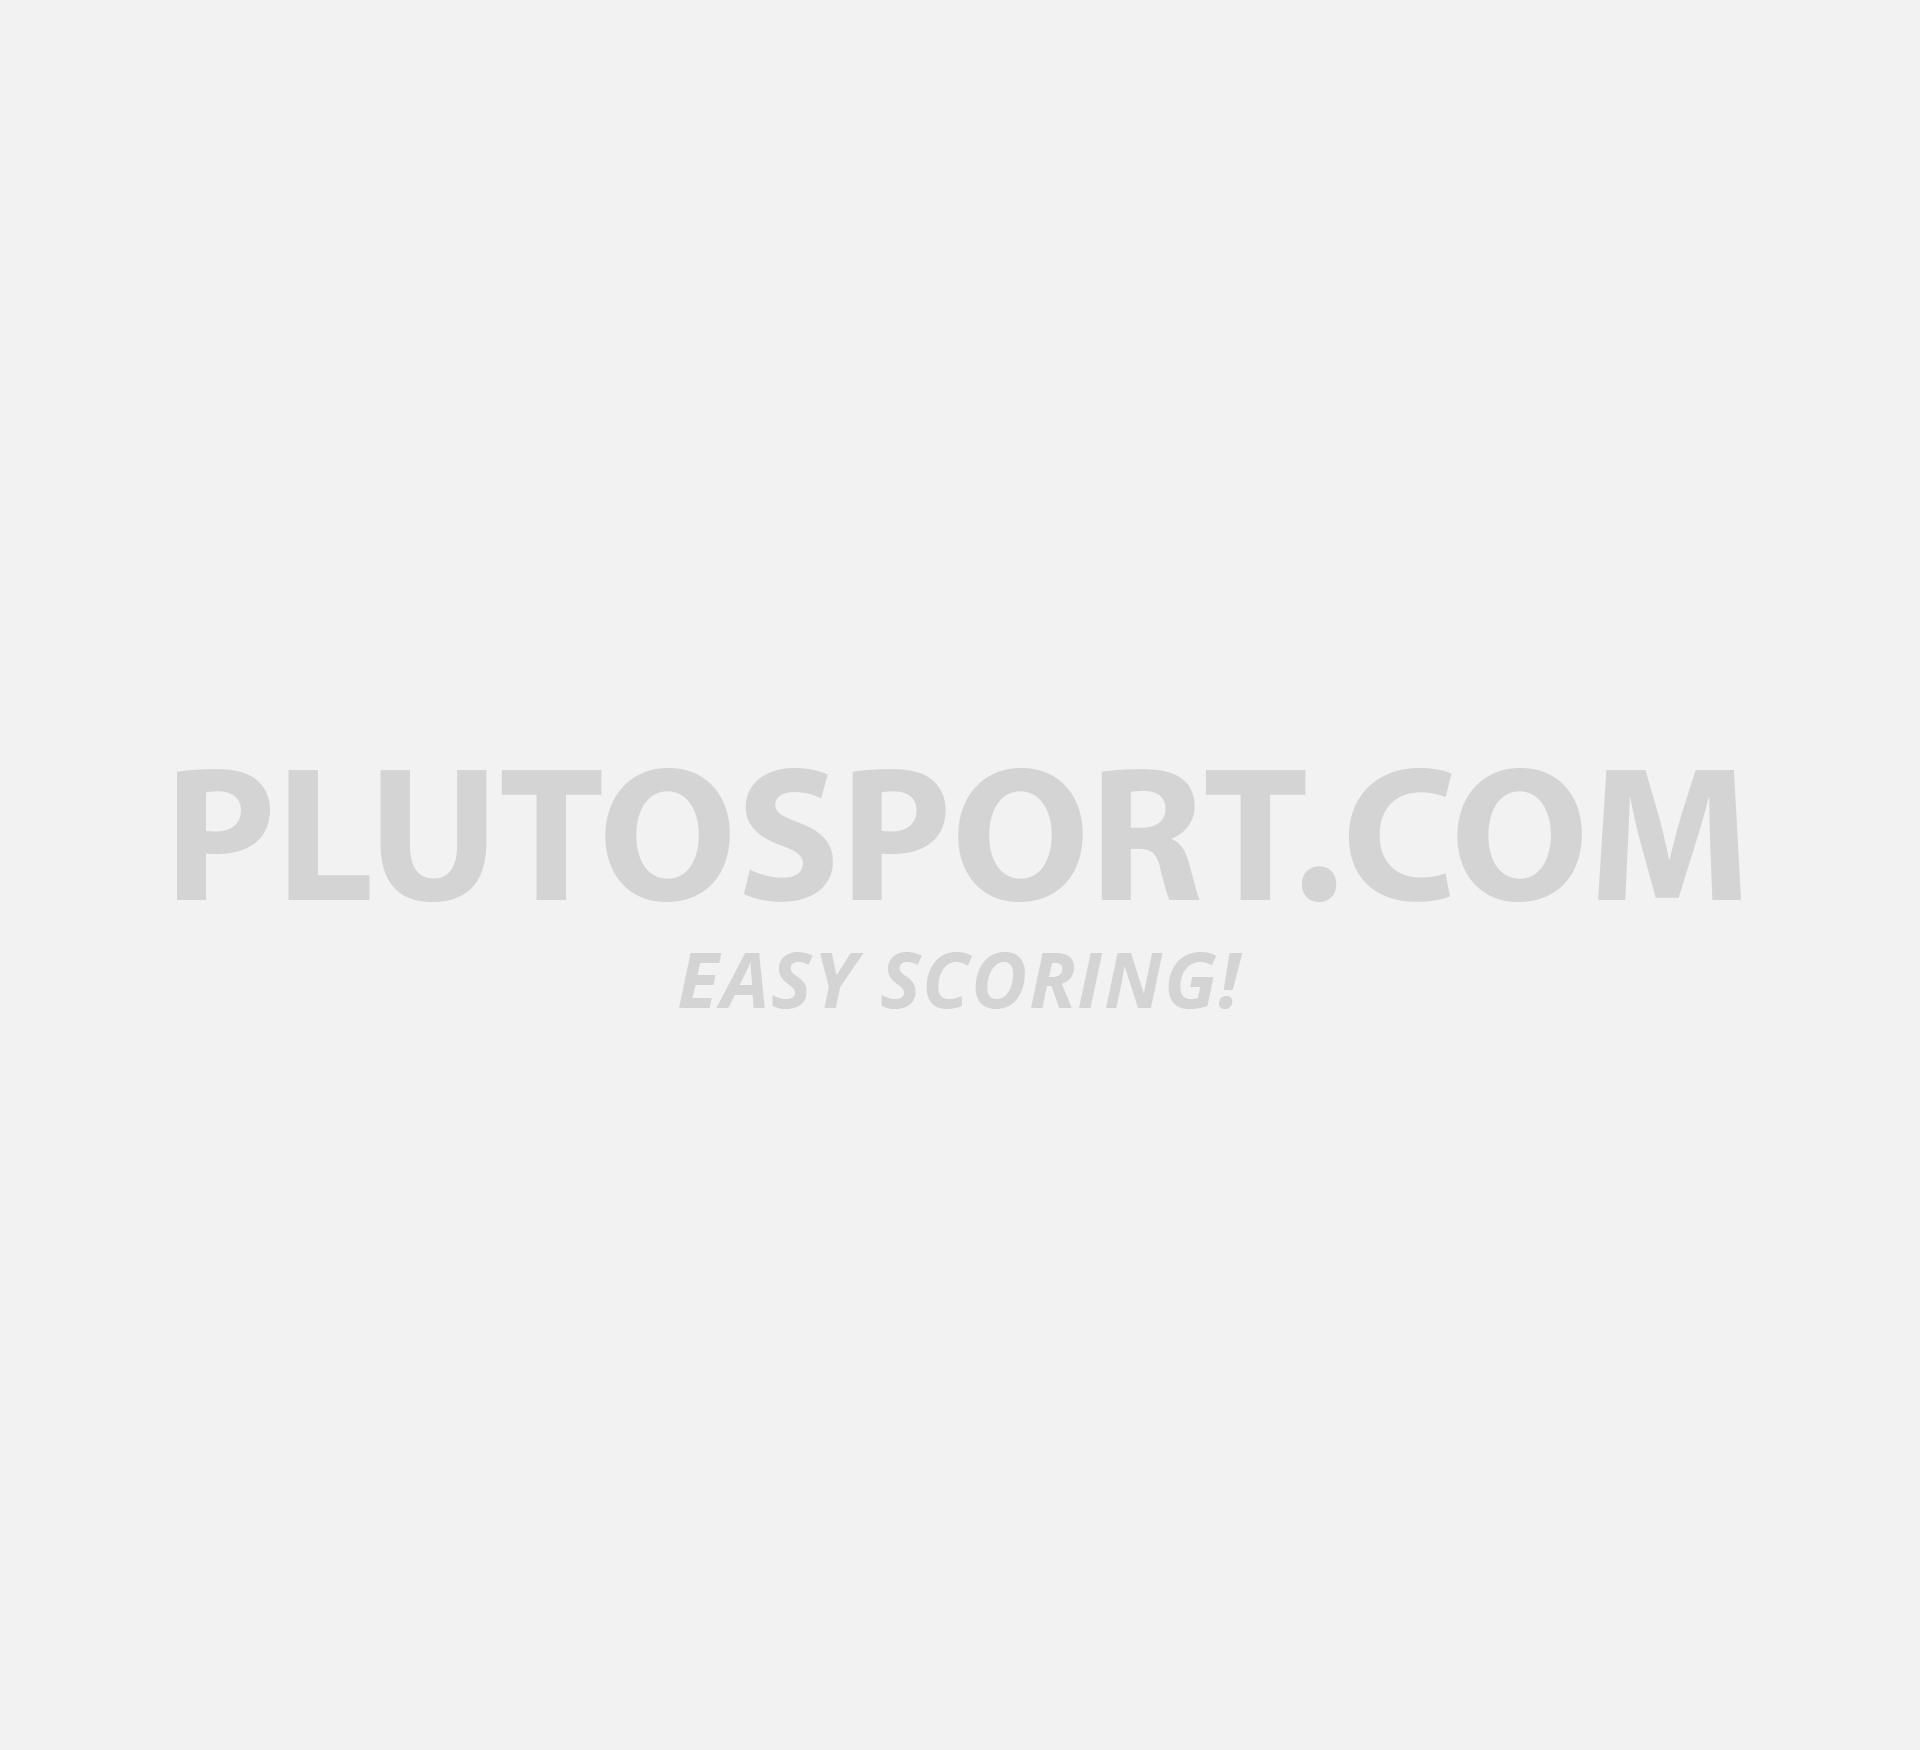 Skechers Twi-Lites 2.0 - Neon Muse Sneakers Girls